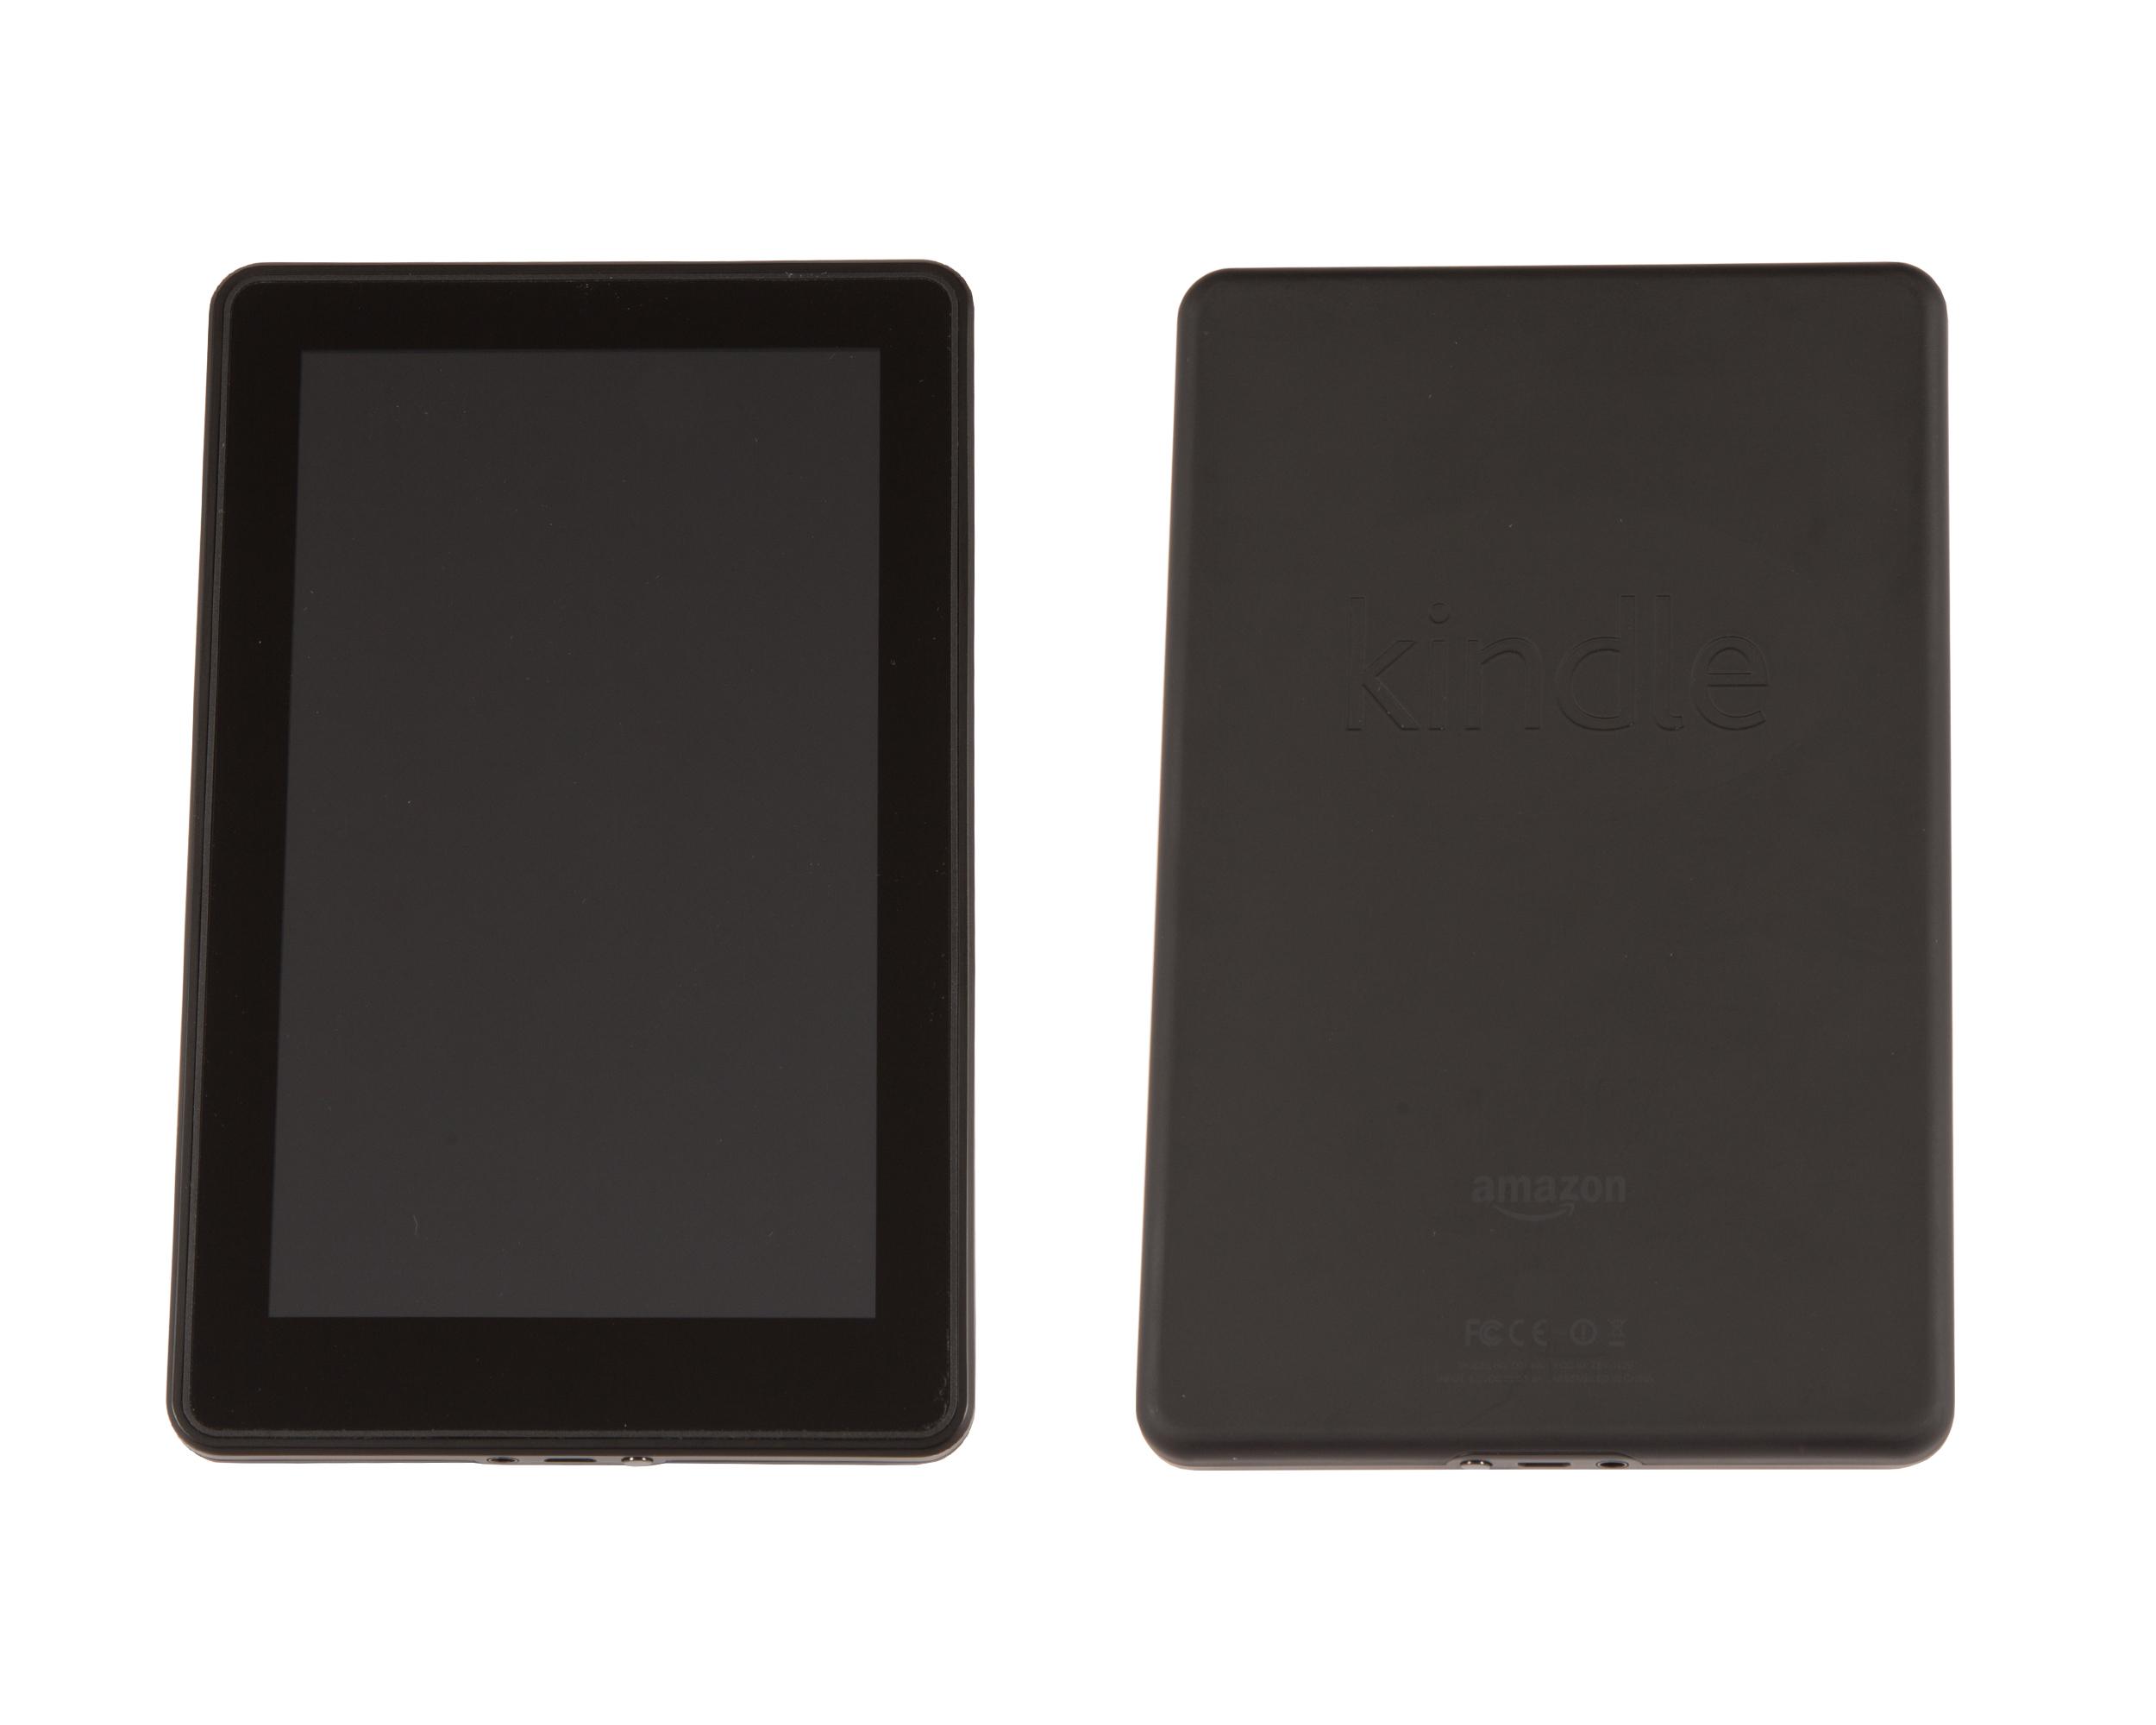 "Amazon Kindle Fire 7"" Black"